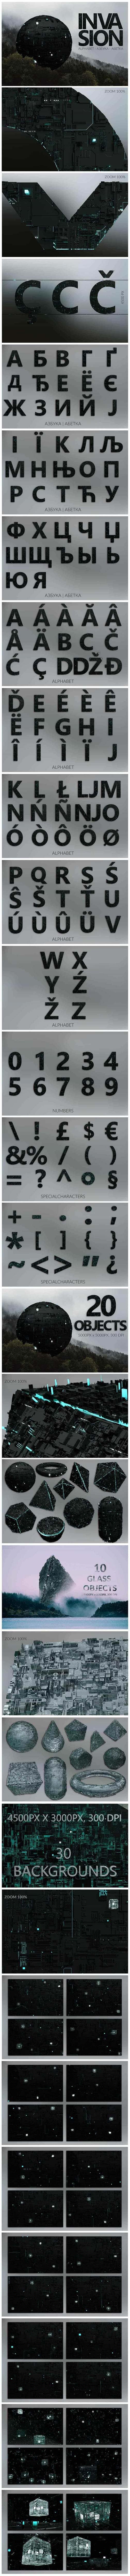 Huge Graphic Bundle Alphabet with 1000+ elements - $25 - Invasion min